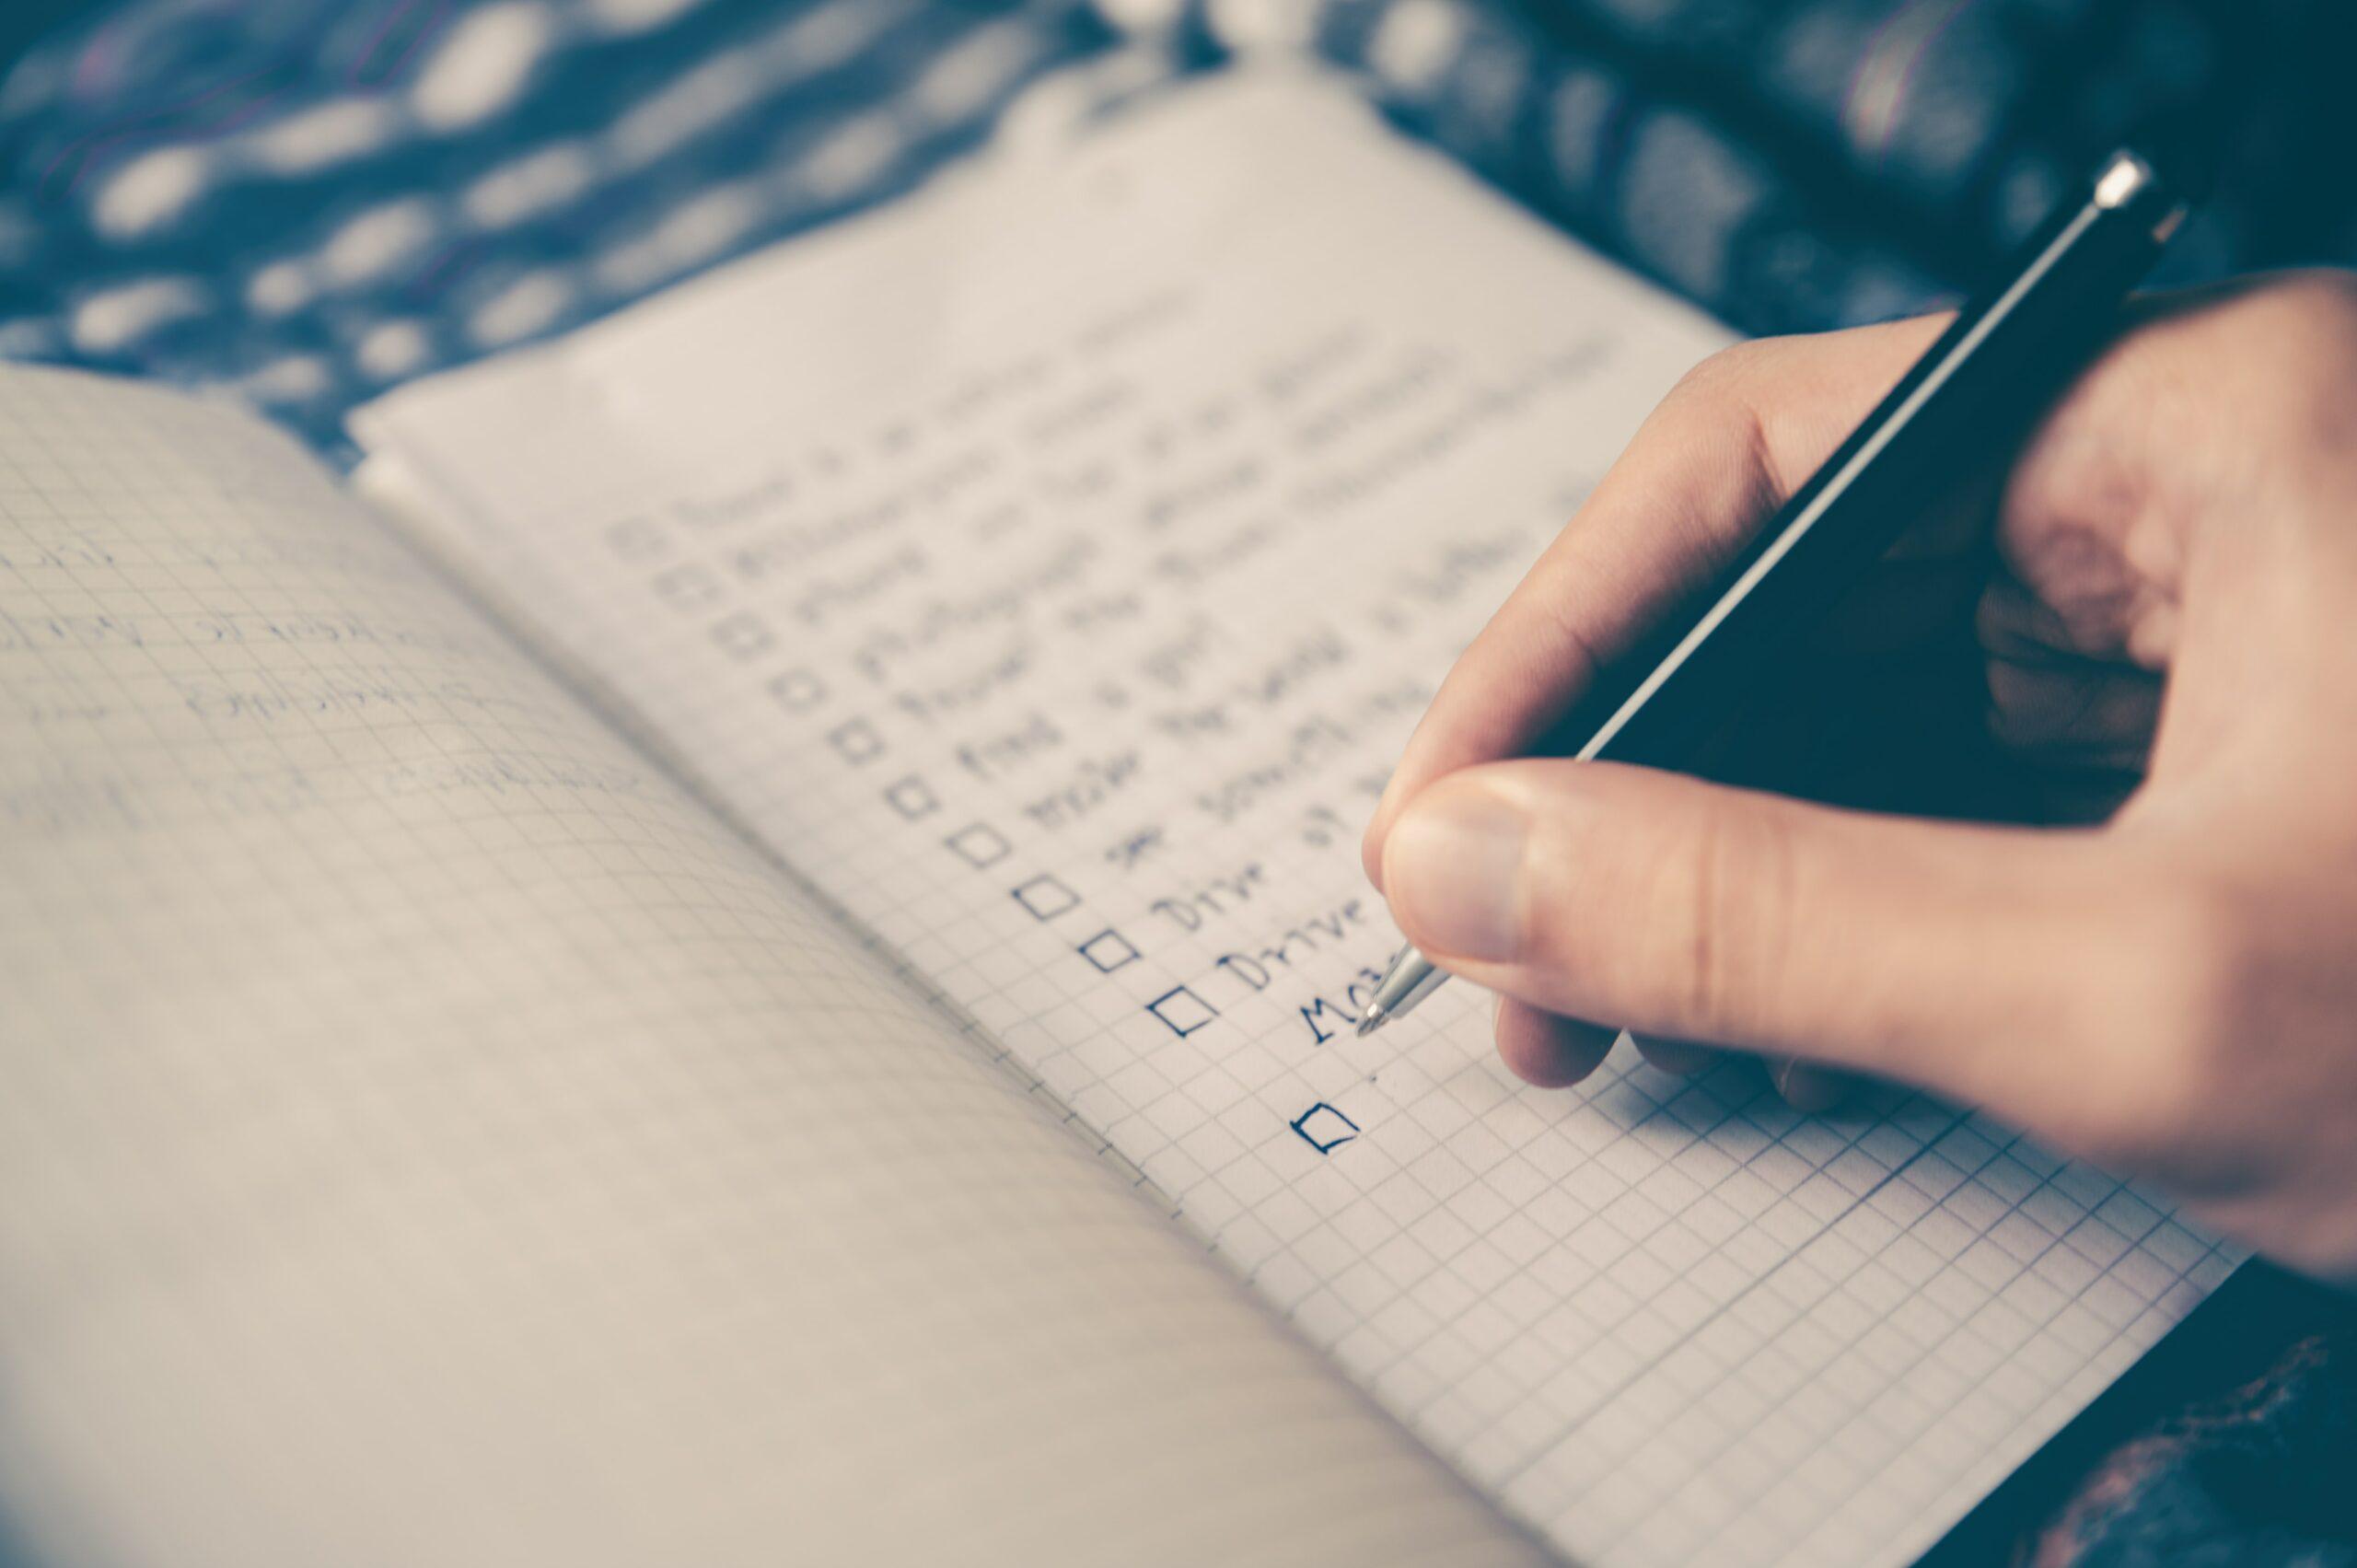 Webteksten schrijven stappenplan